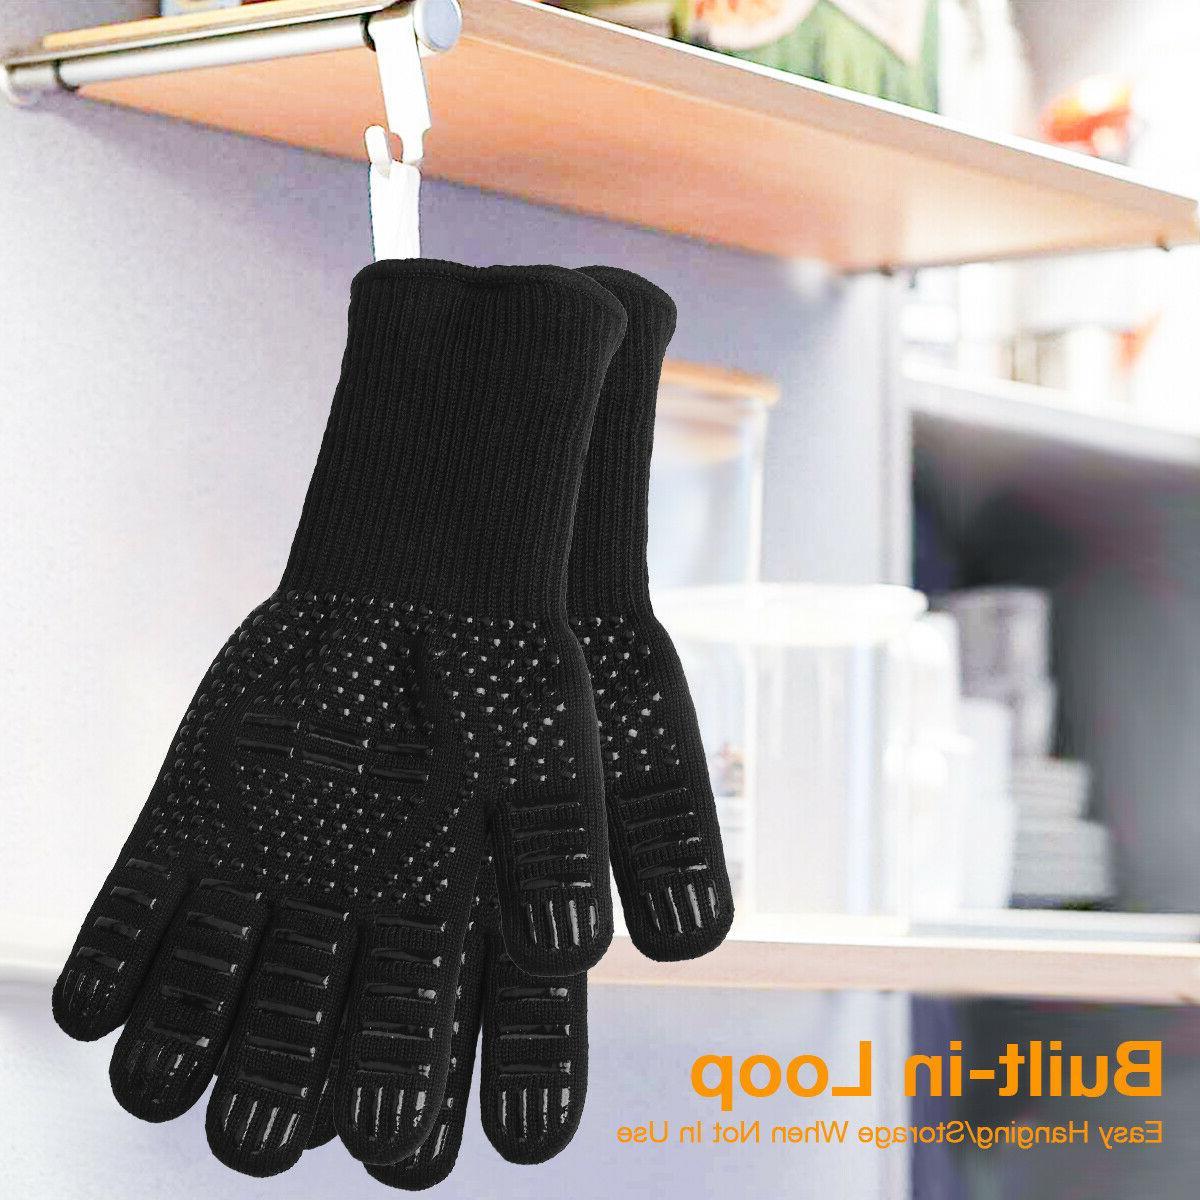 2PCS Heat Resistant Gloves BBQ US